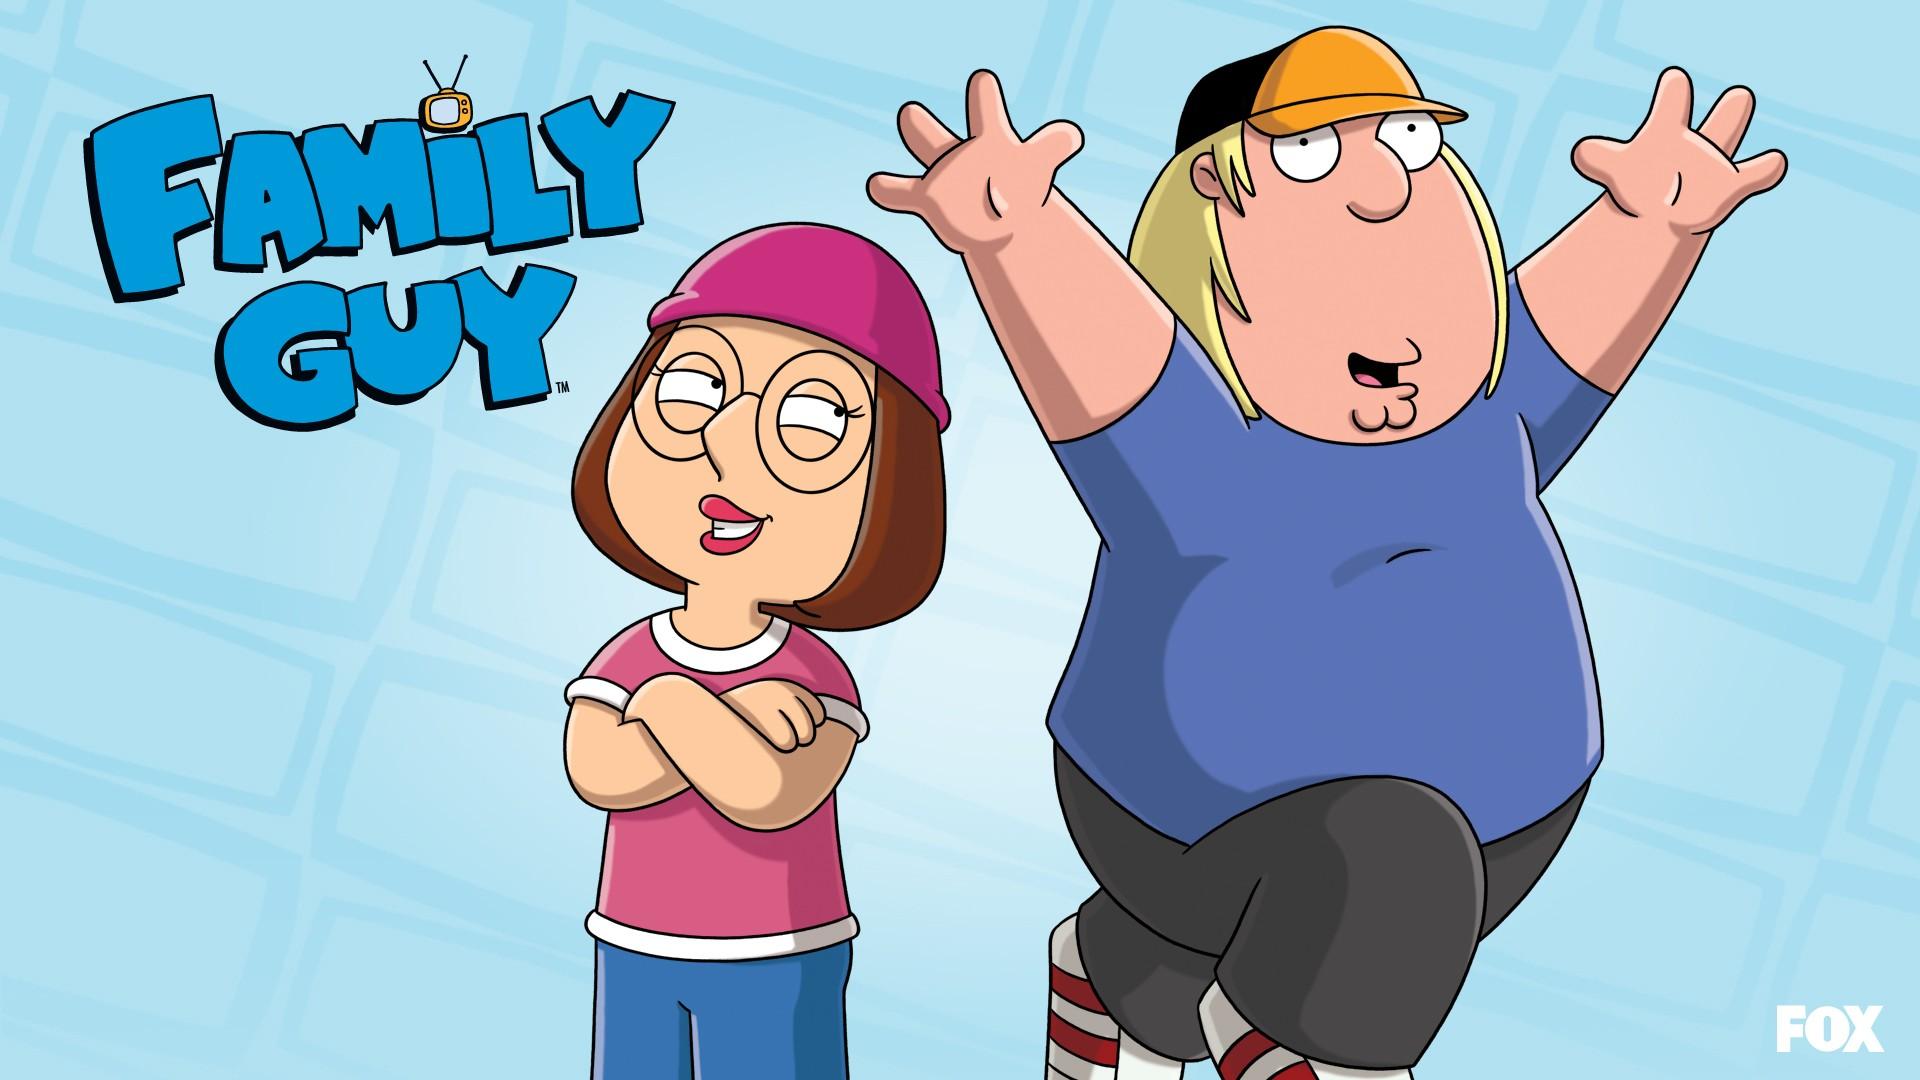 Family Guy Peter HD Desktop Wallpaper HD Desktop Wallpaper 1920x1080